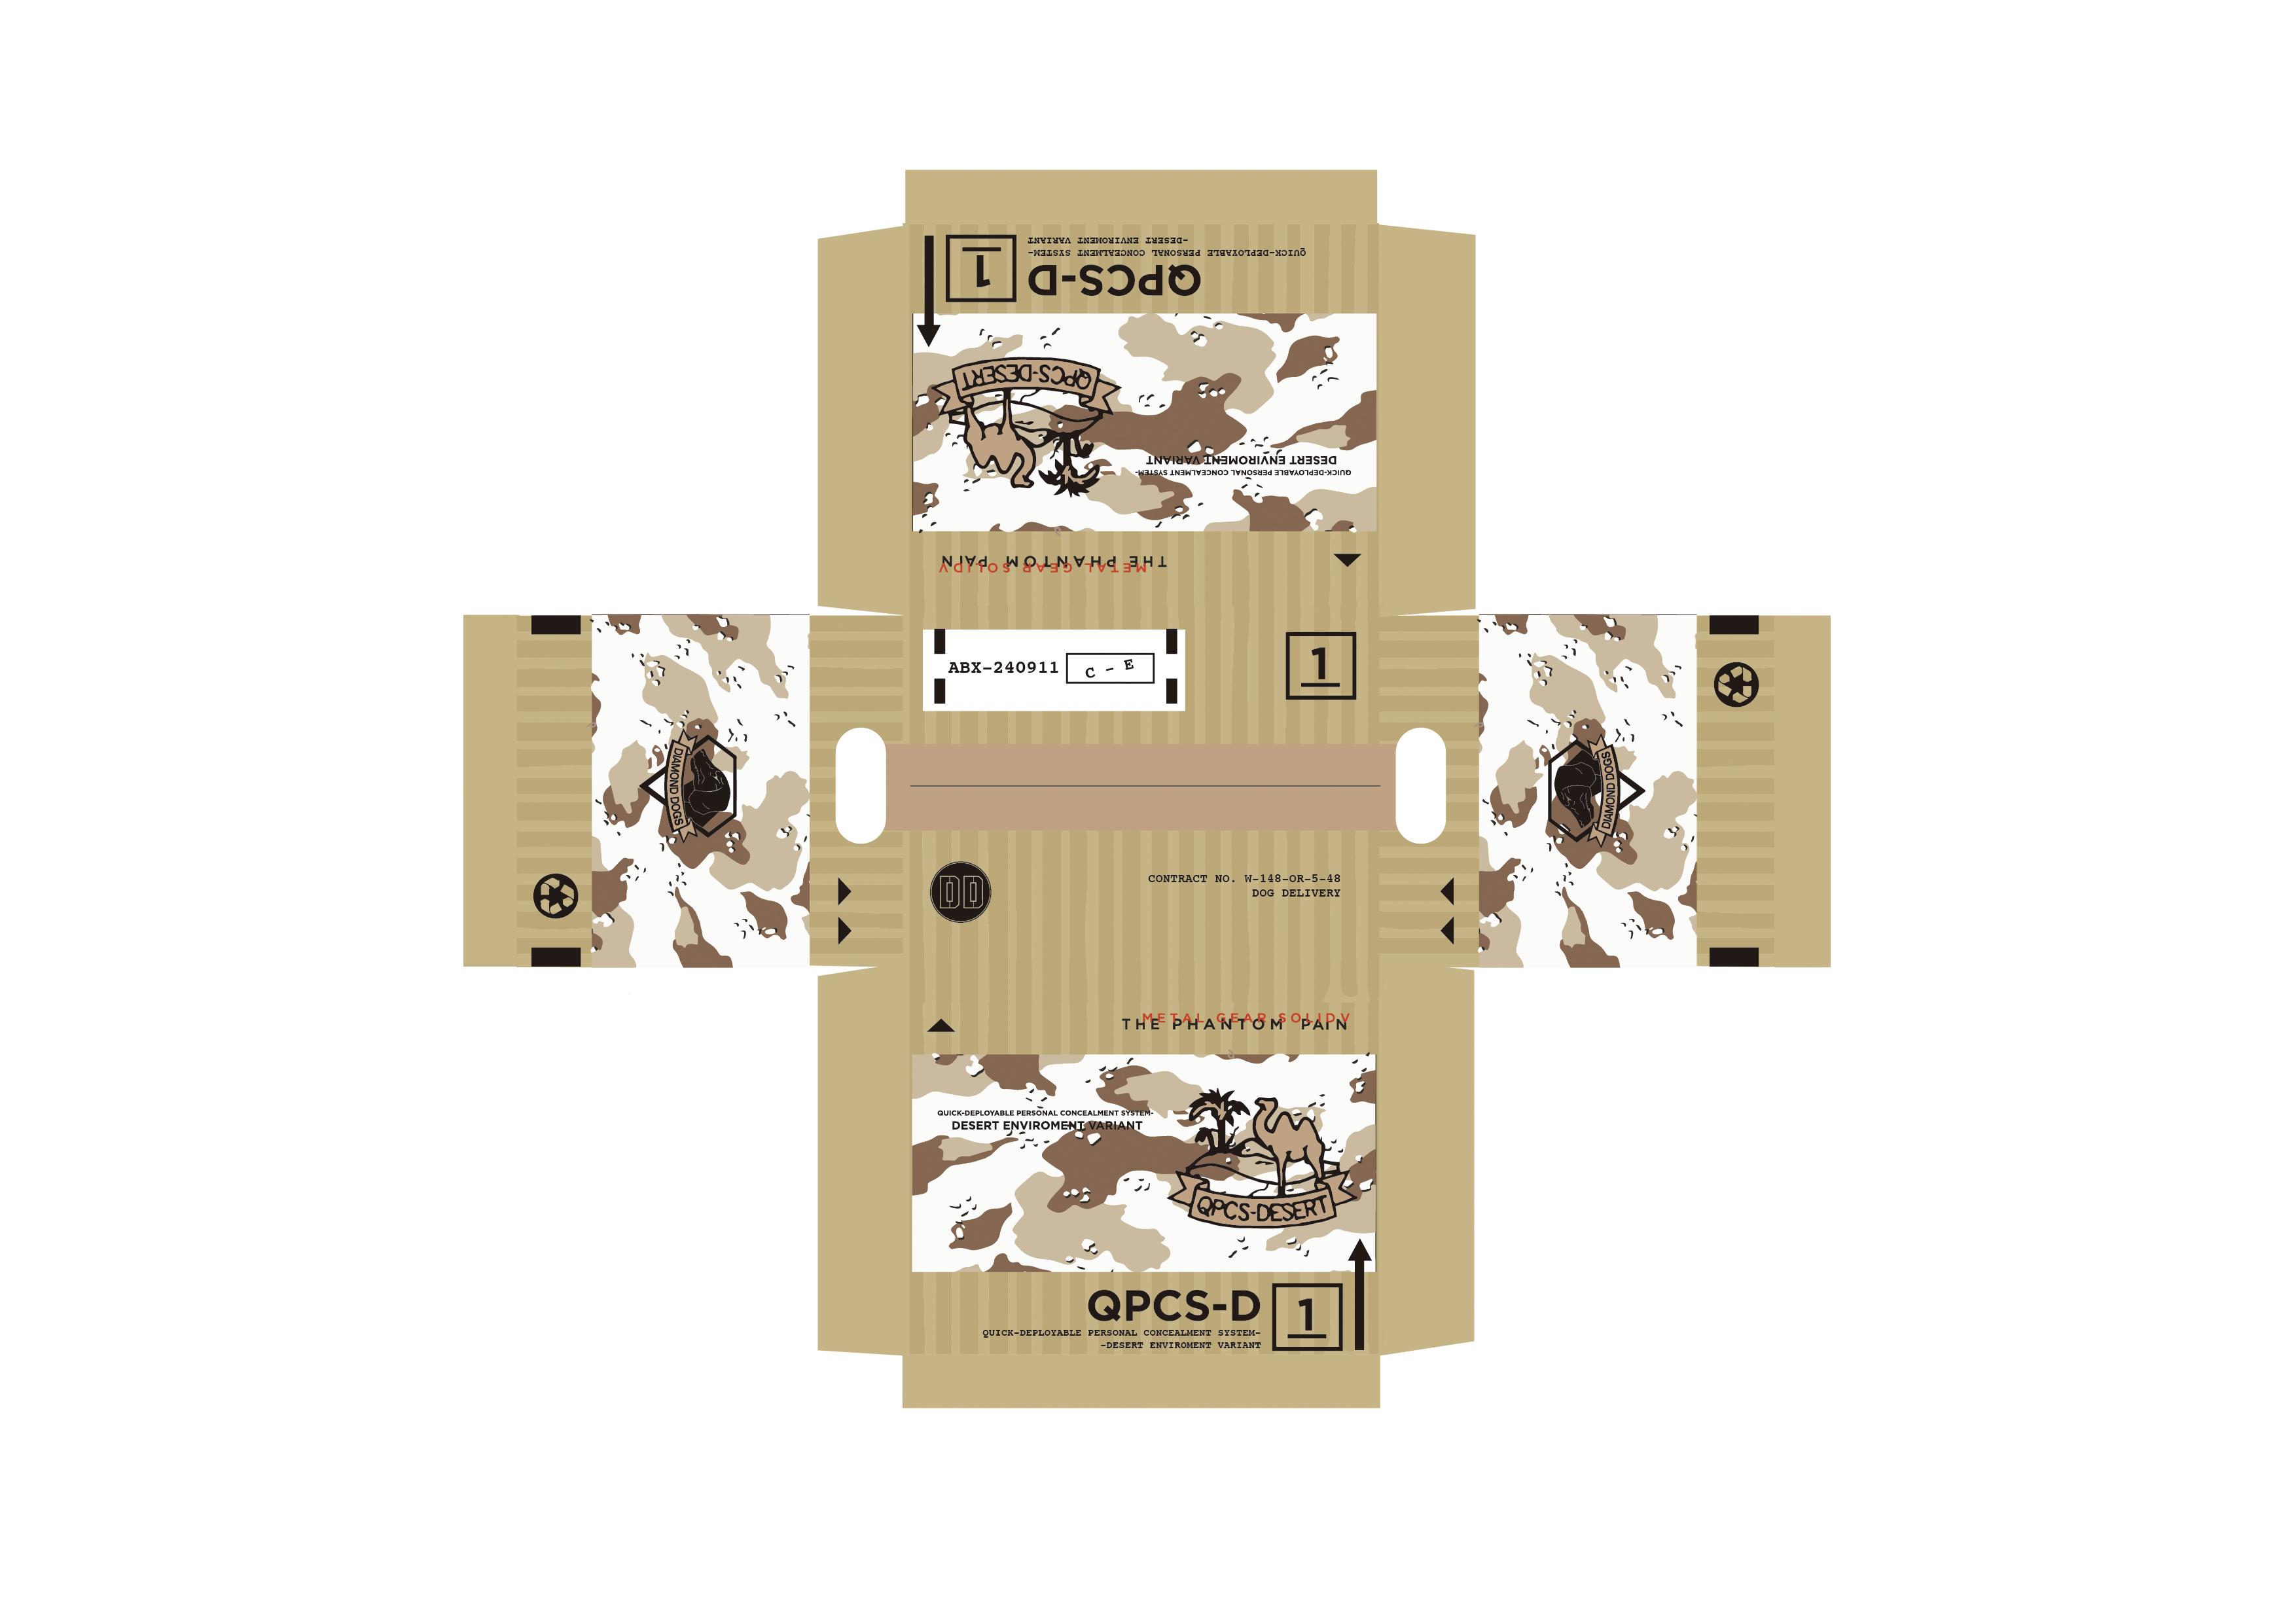 Metal gear phantom pain desert camo cardboard box by moloch15 on metal gear phantom pain desert camo cardboard box by moloch15 jeuxipadfo Gallery